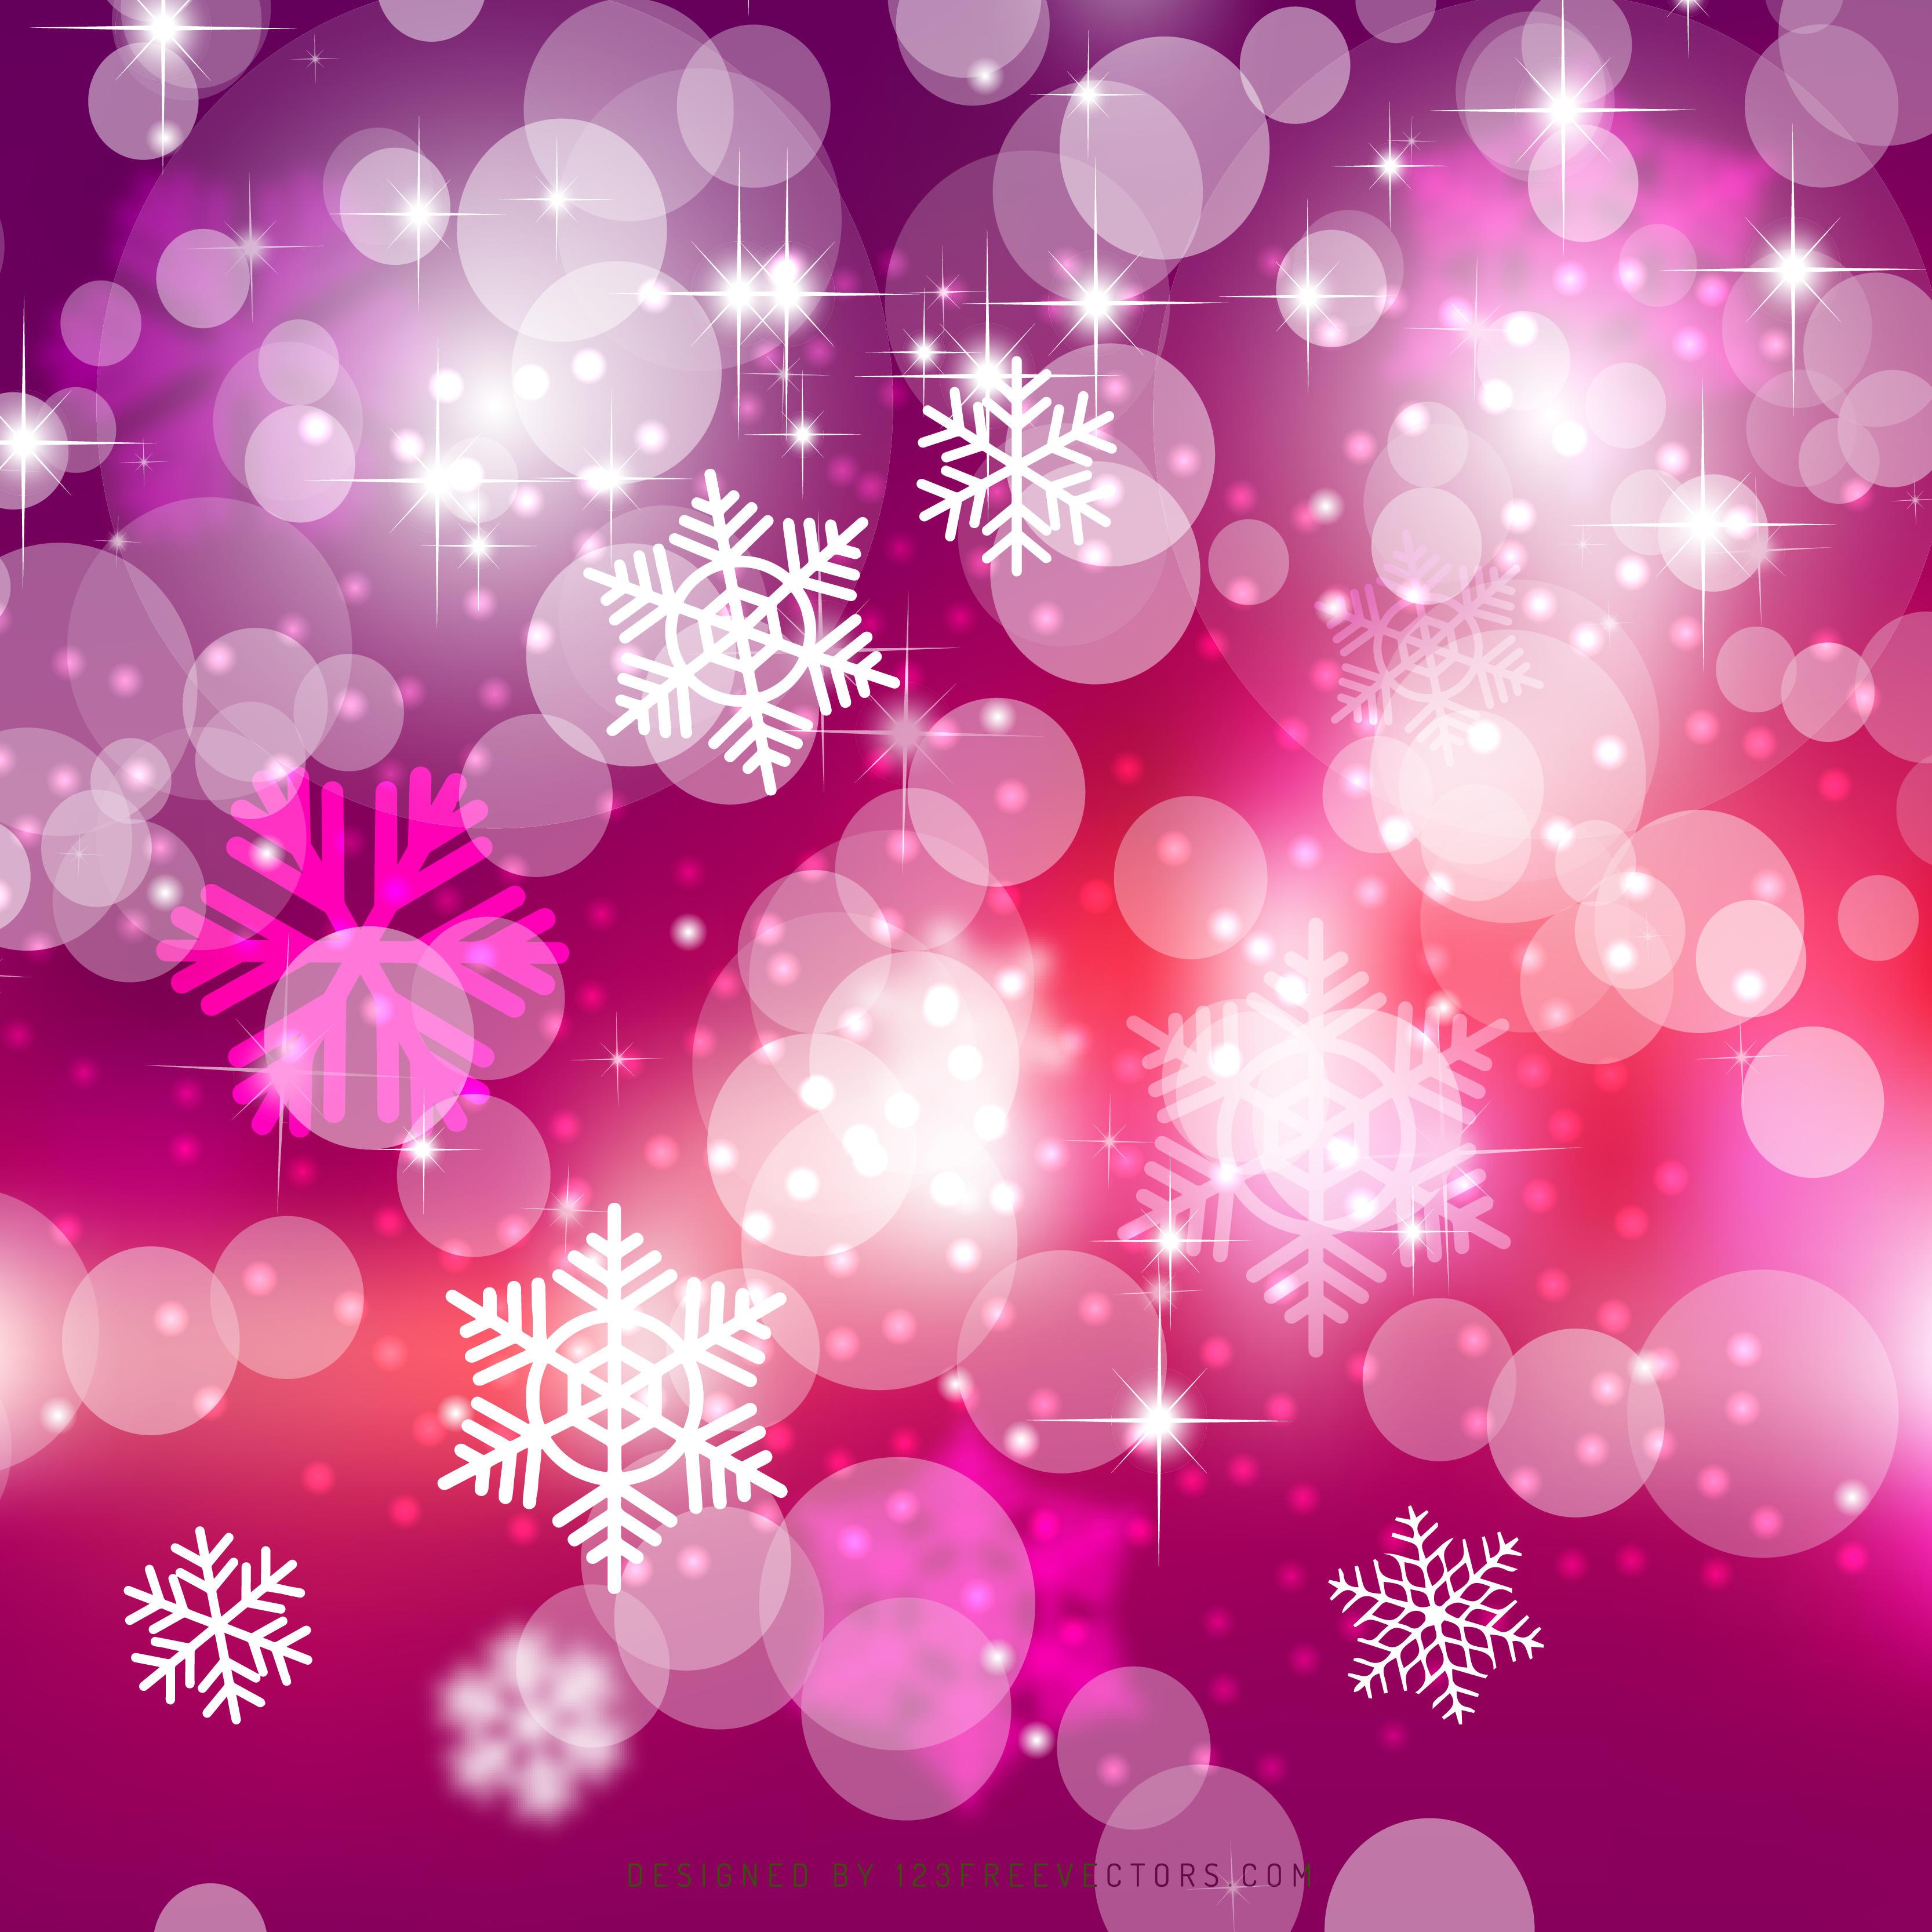 Pink Bokeh Christmas Lights Background Image